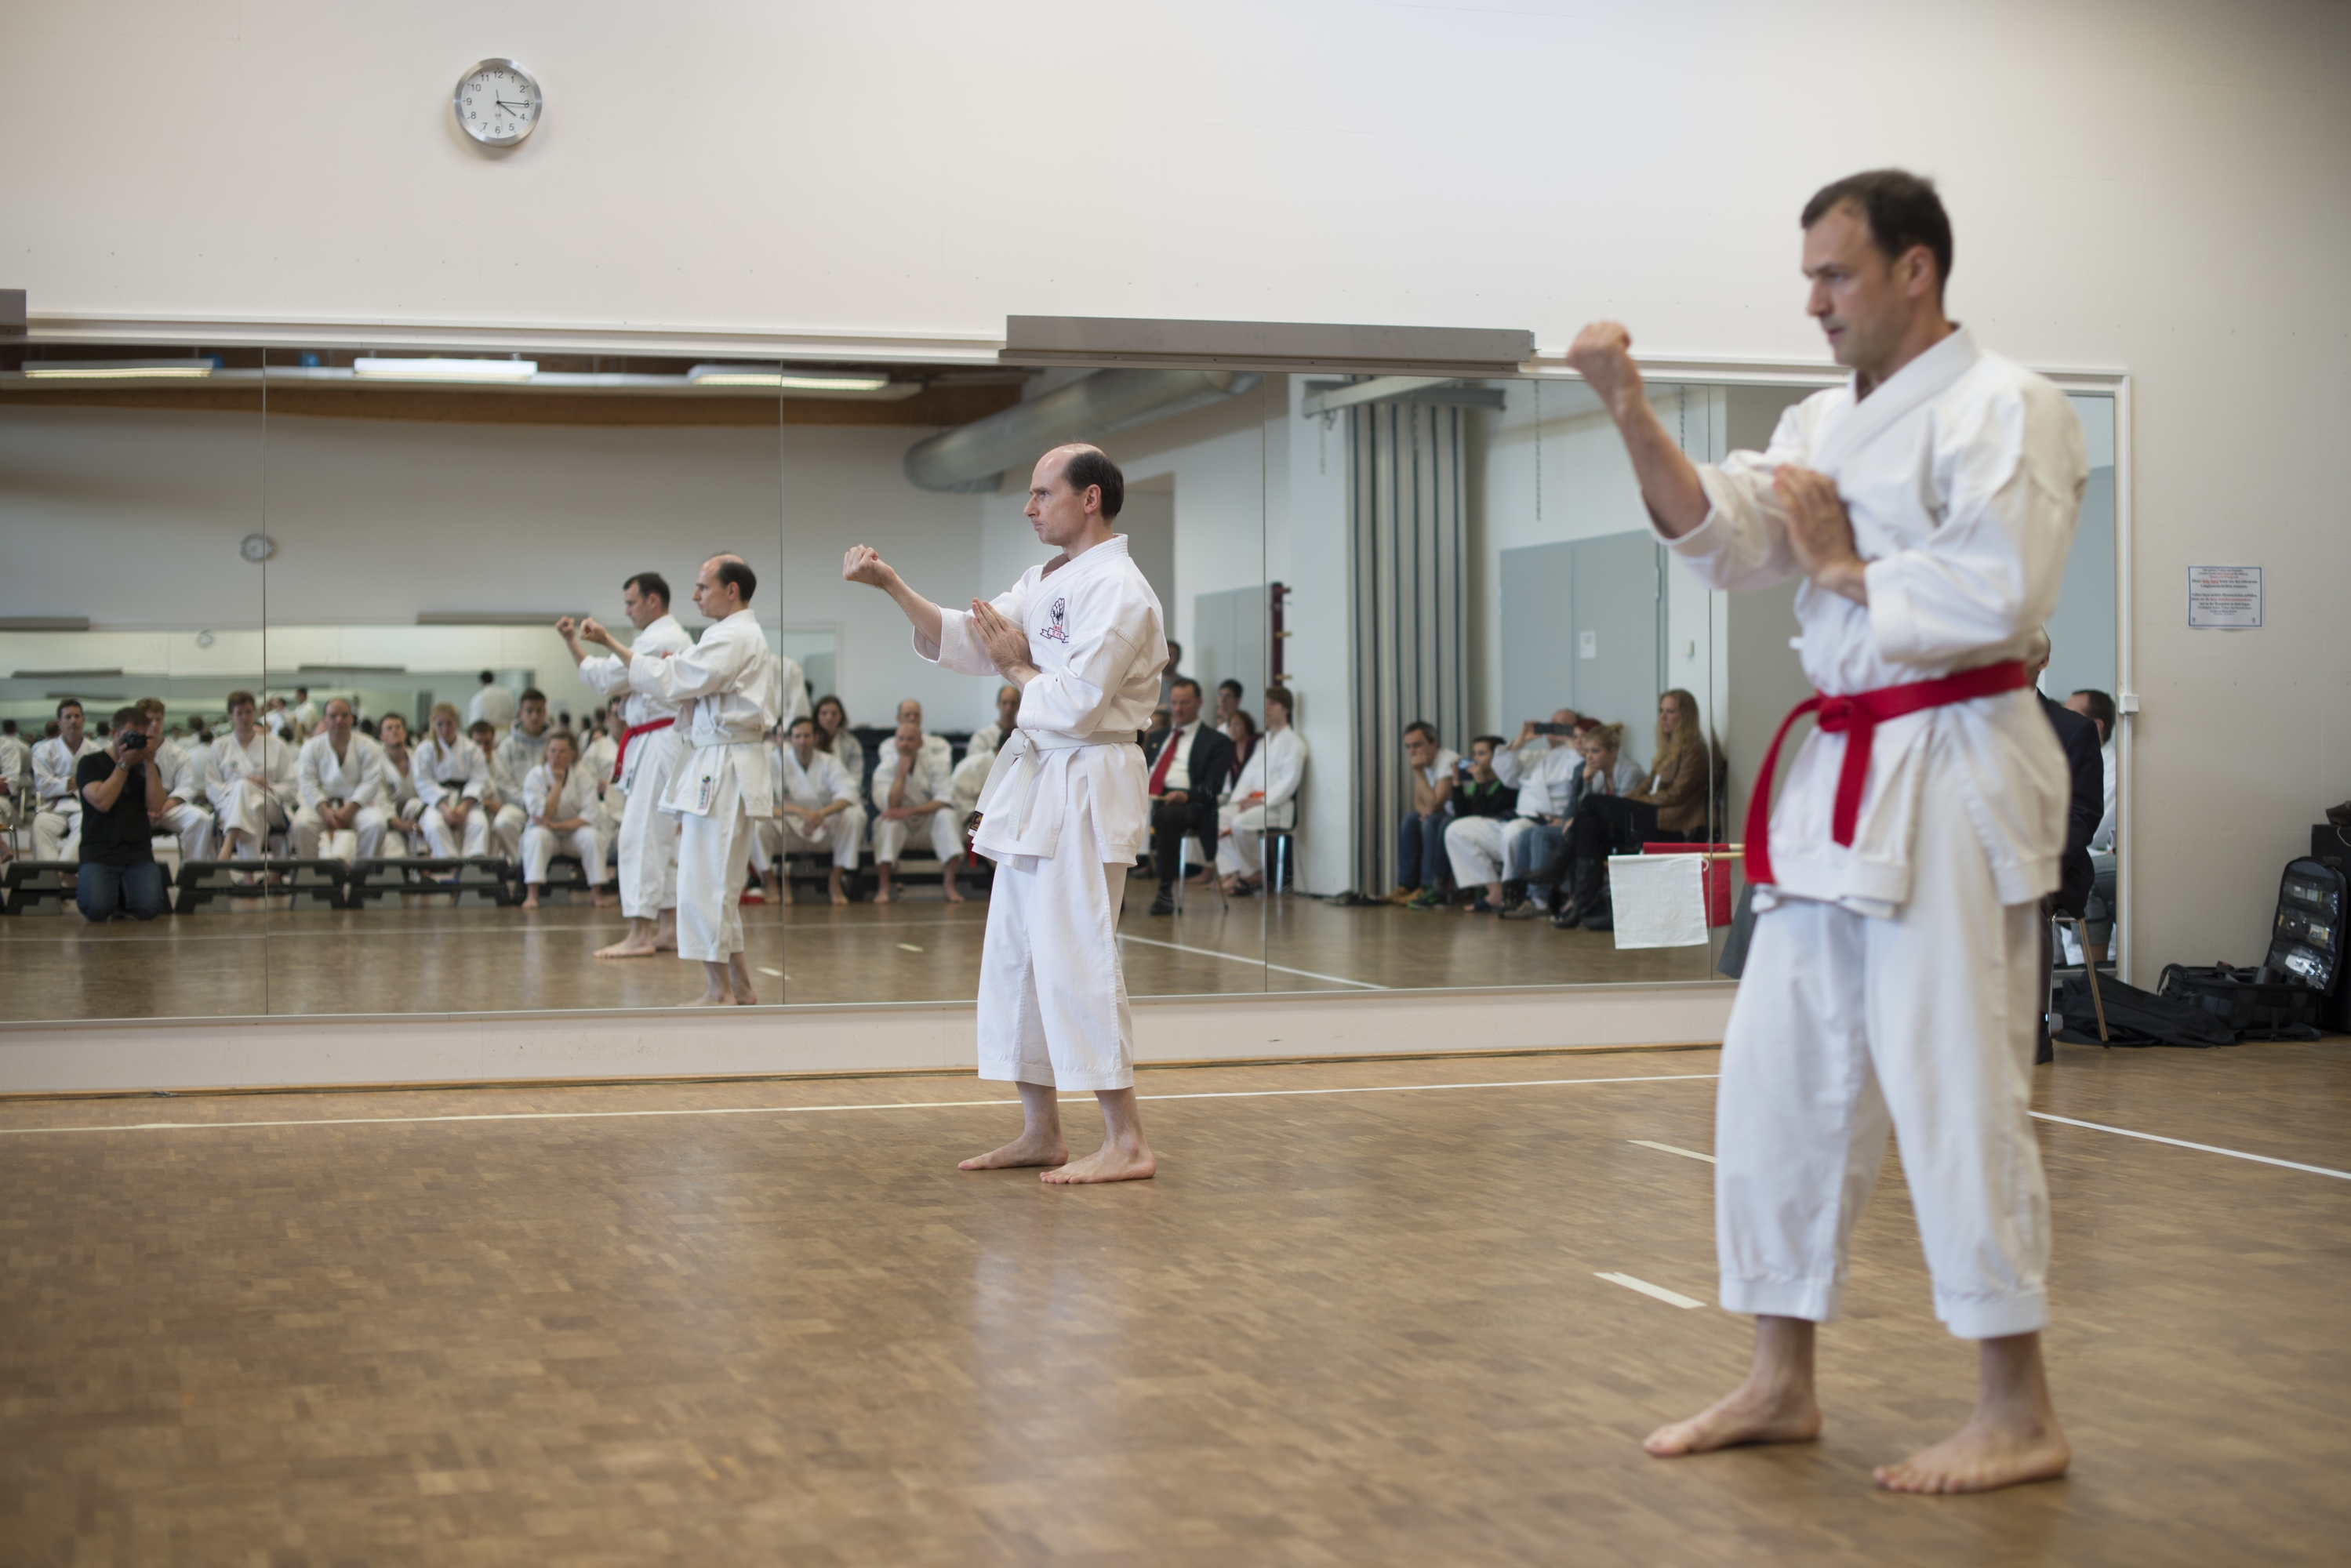 2016-04-26 Kata Turnier Kaarst 281